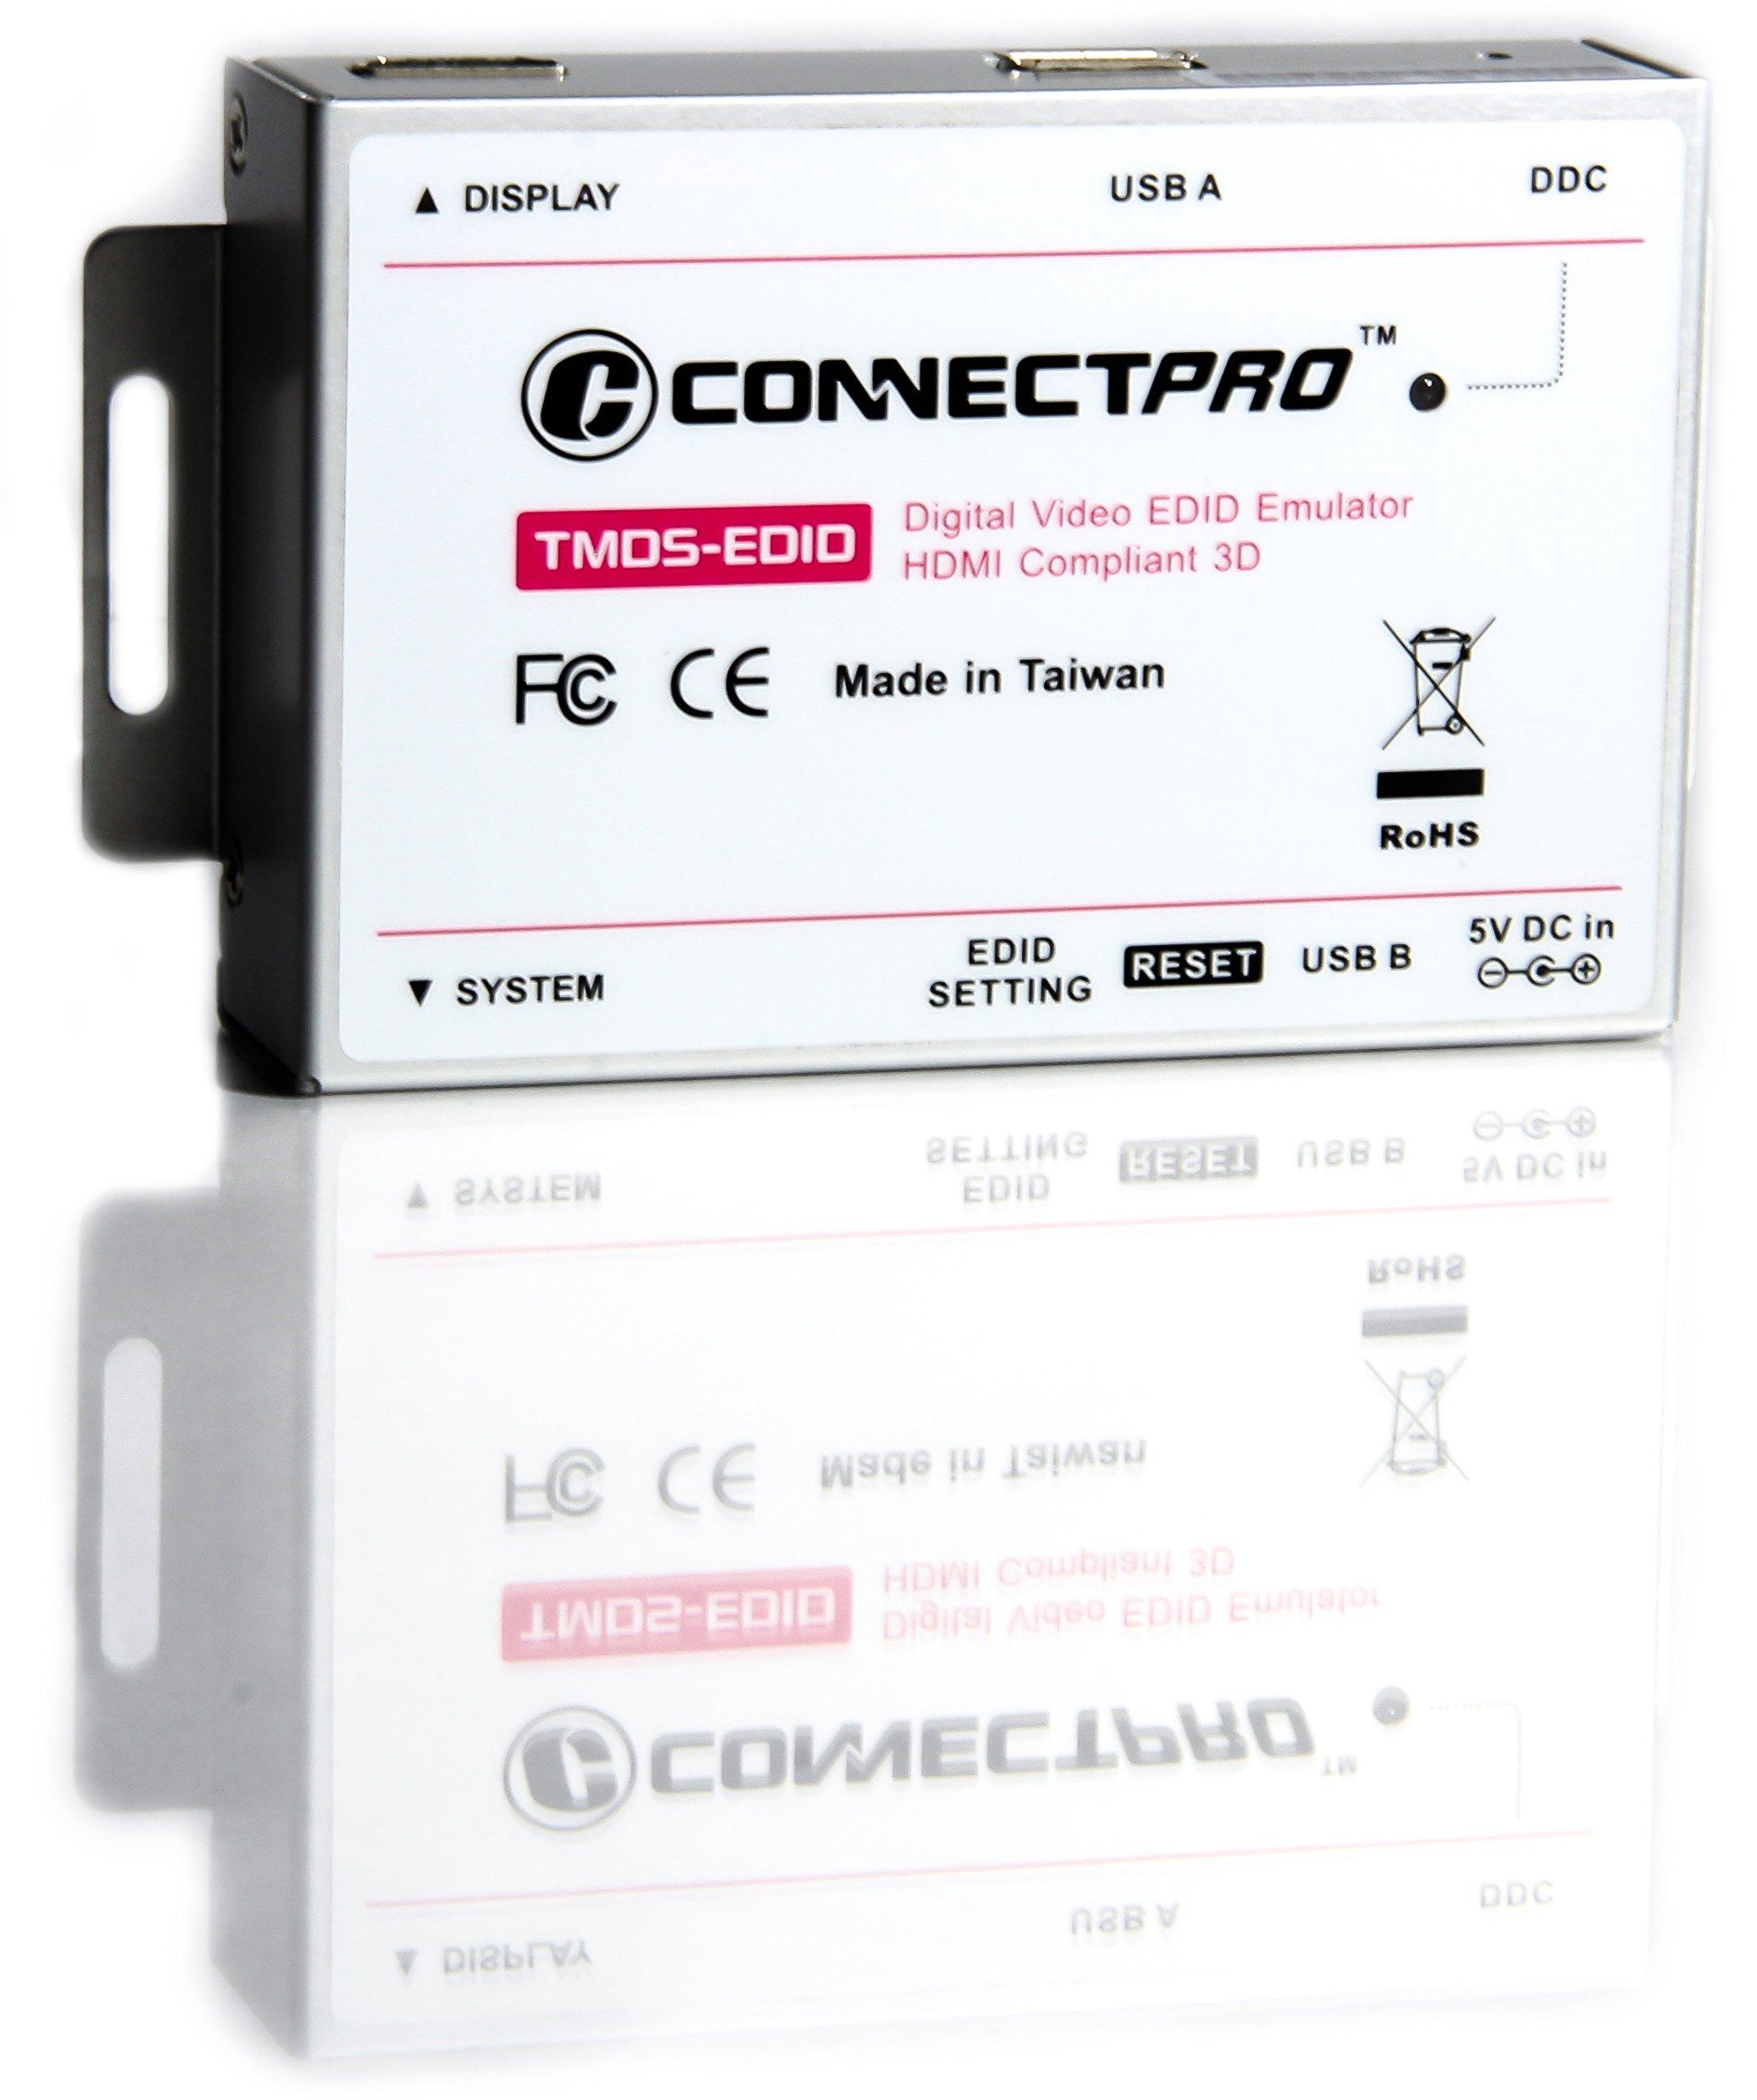 ConnectPRO TMDS-KITU1, HDMI EDID/DDC Video Ghosting Emulator